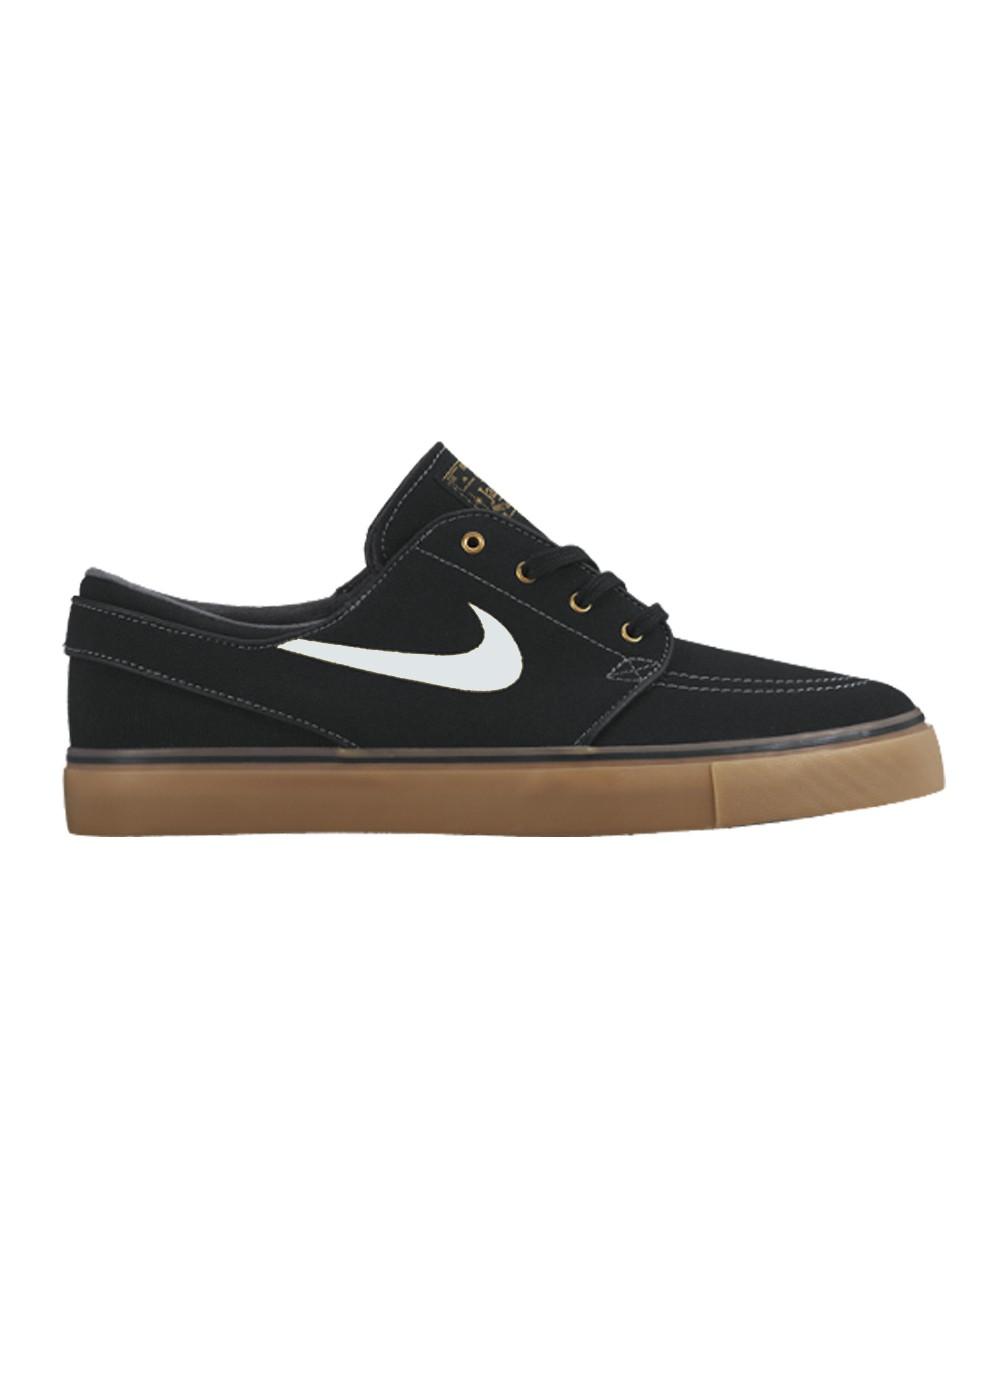 a5c35f8cdc03 Nike SB Skateboarding Shoe Zoom Stefan Janoski Canvas